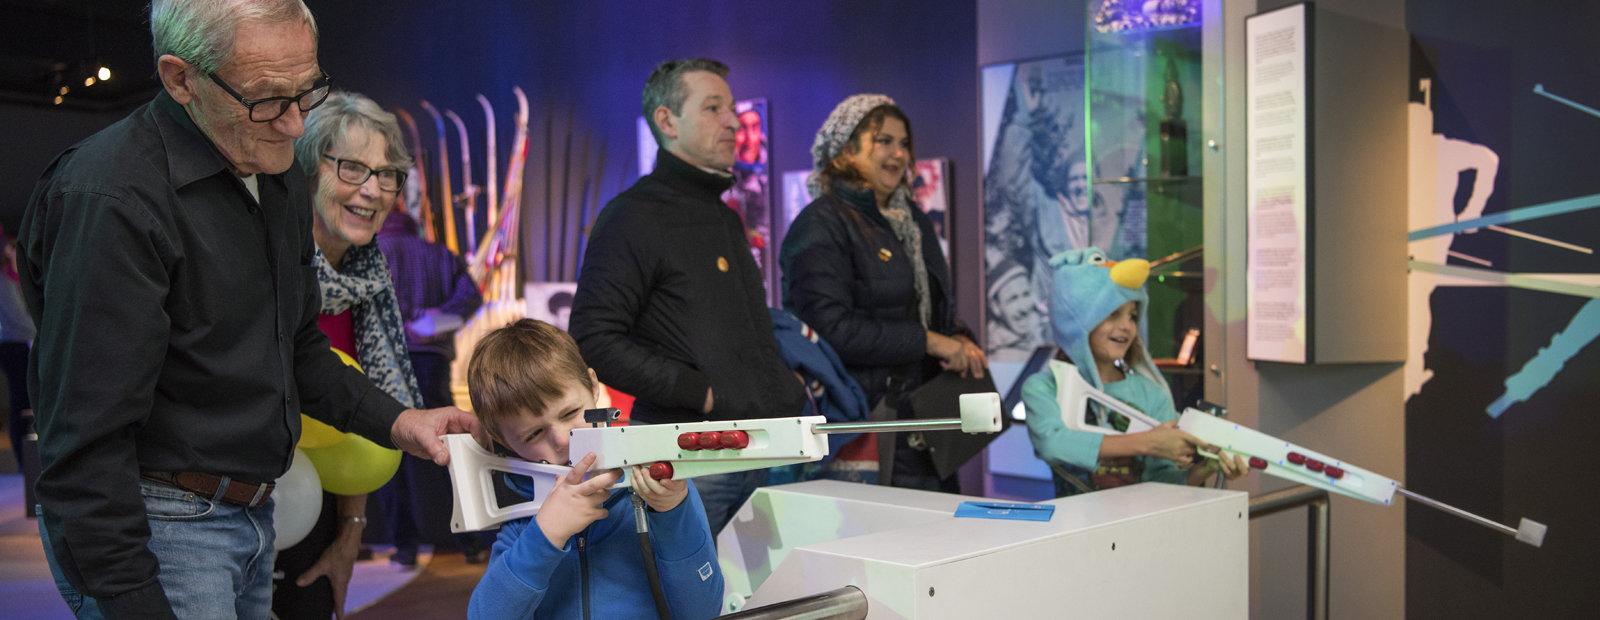 Barn og voksne prøver skiskyttersimulator.